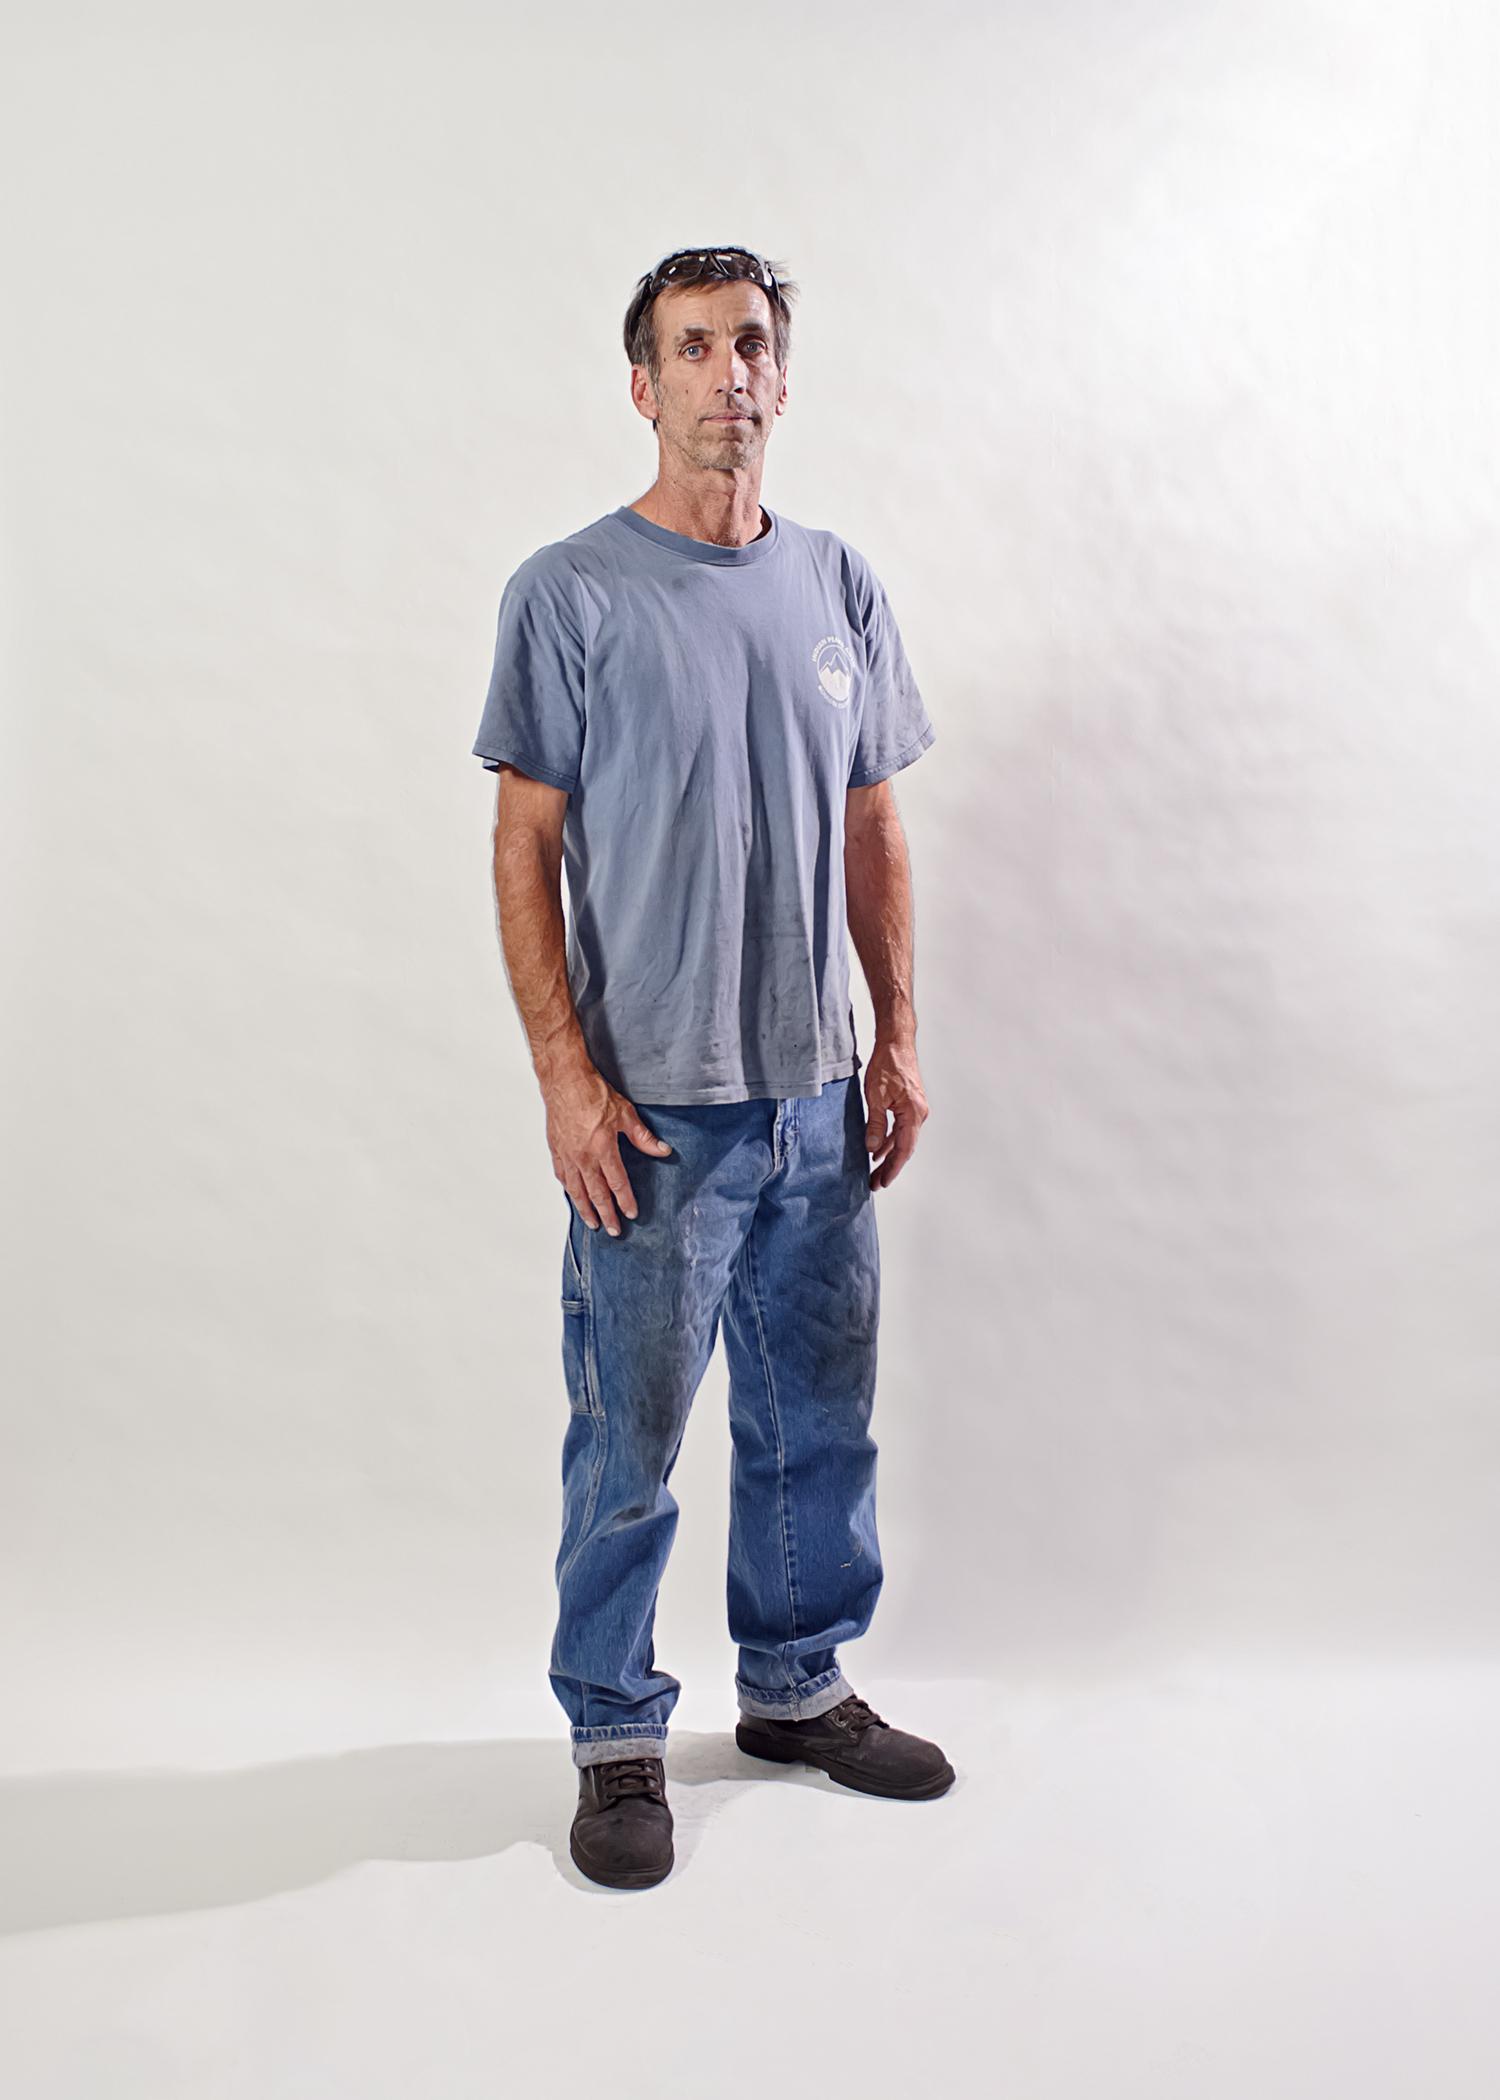 Jim  Master Auto Mechanic.